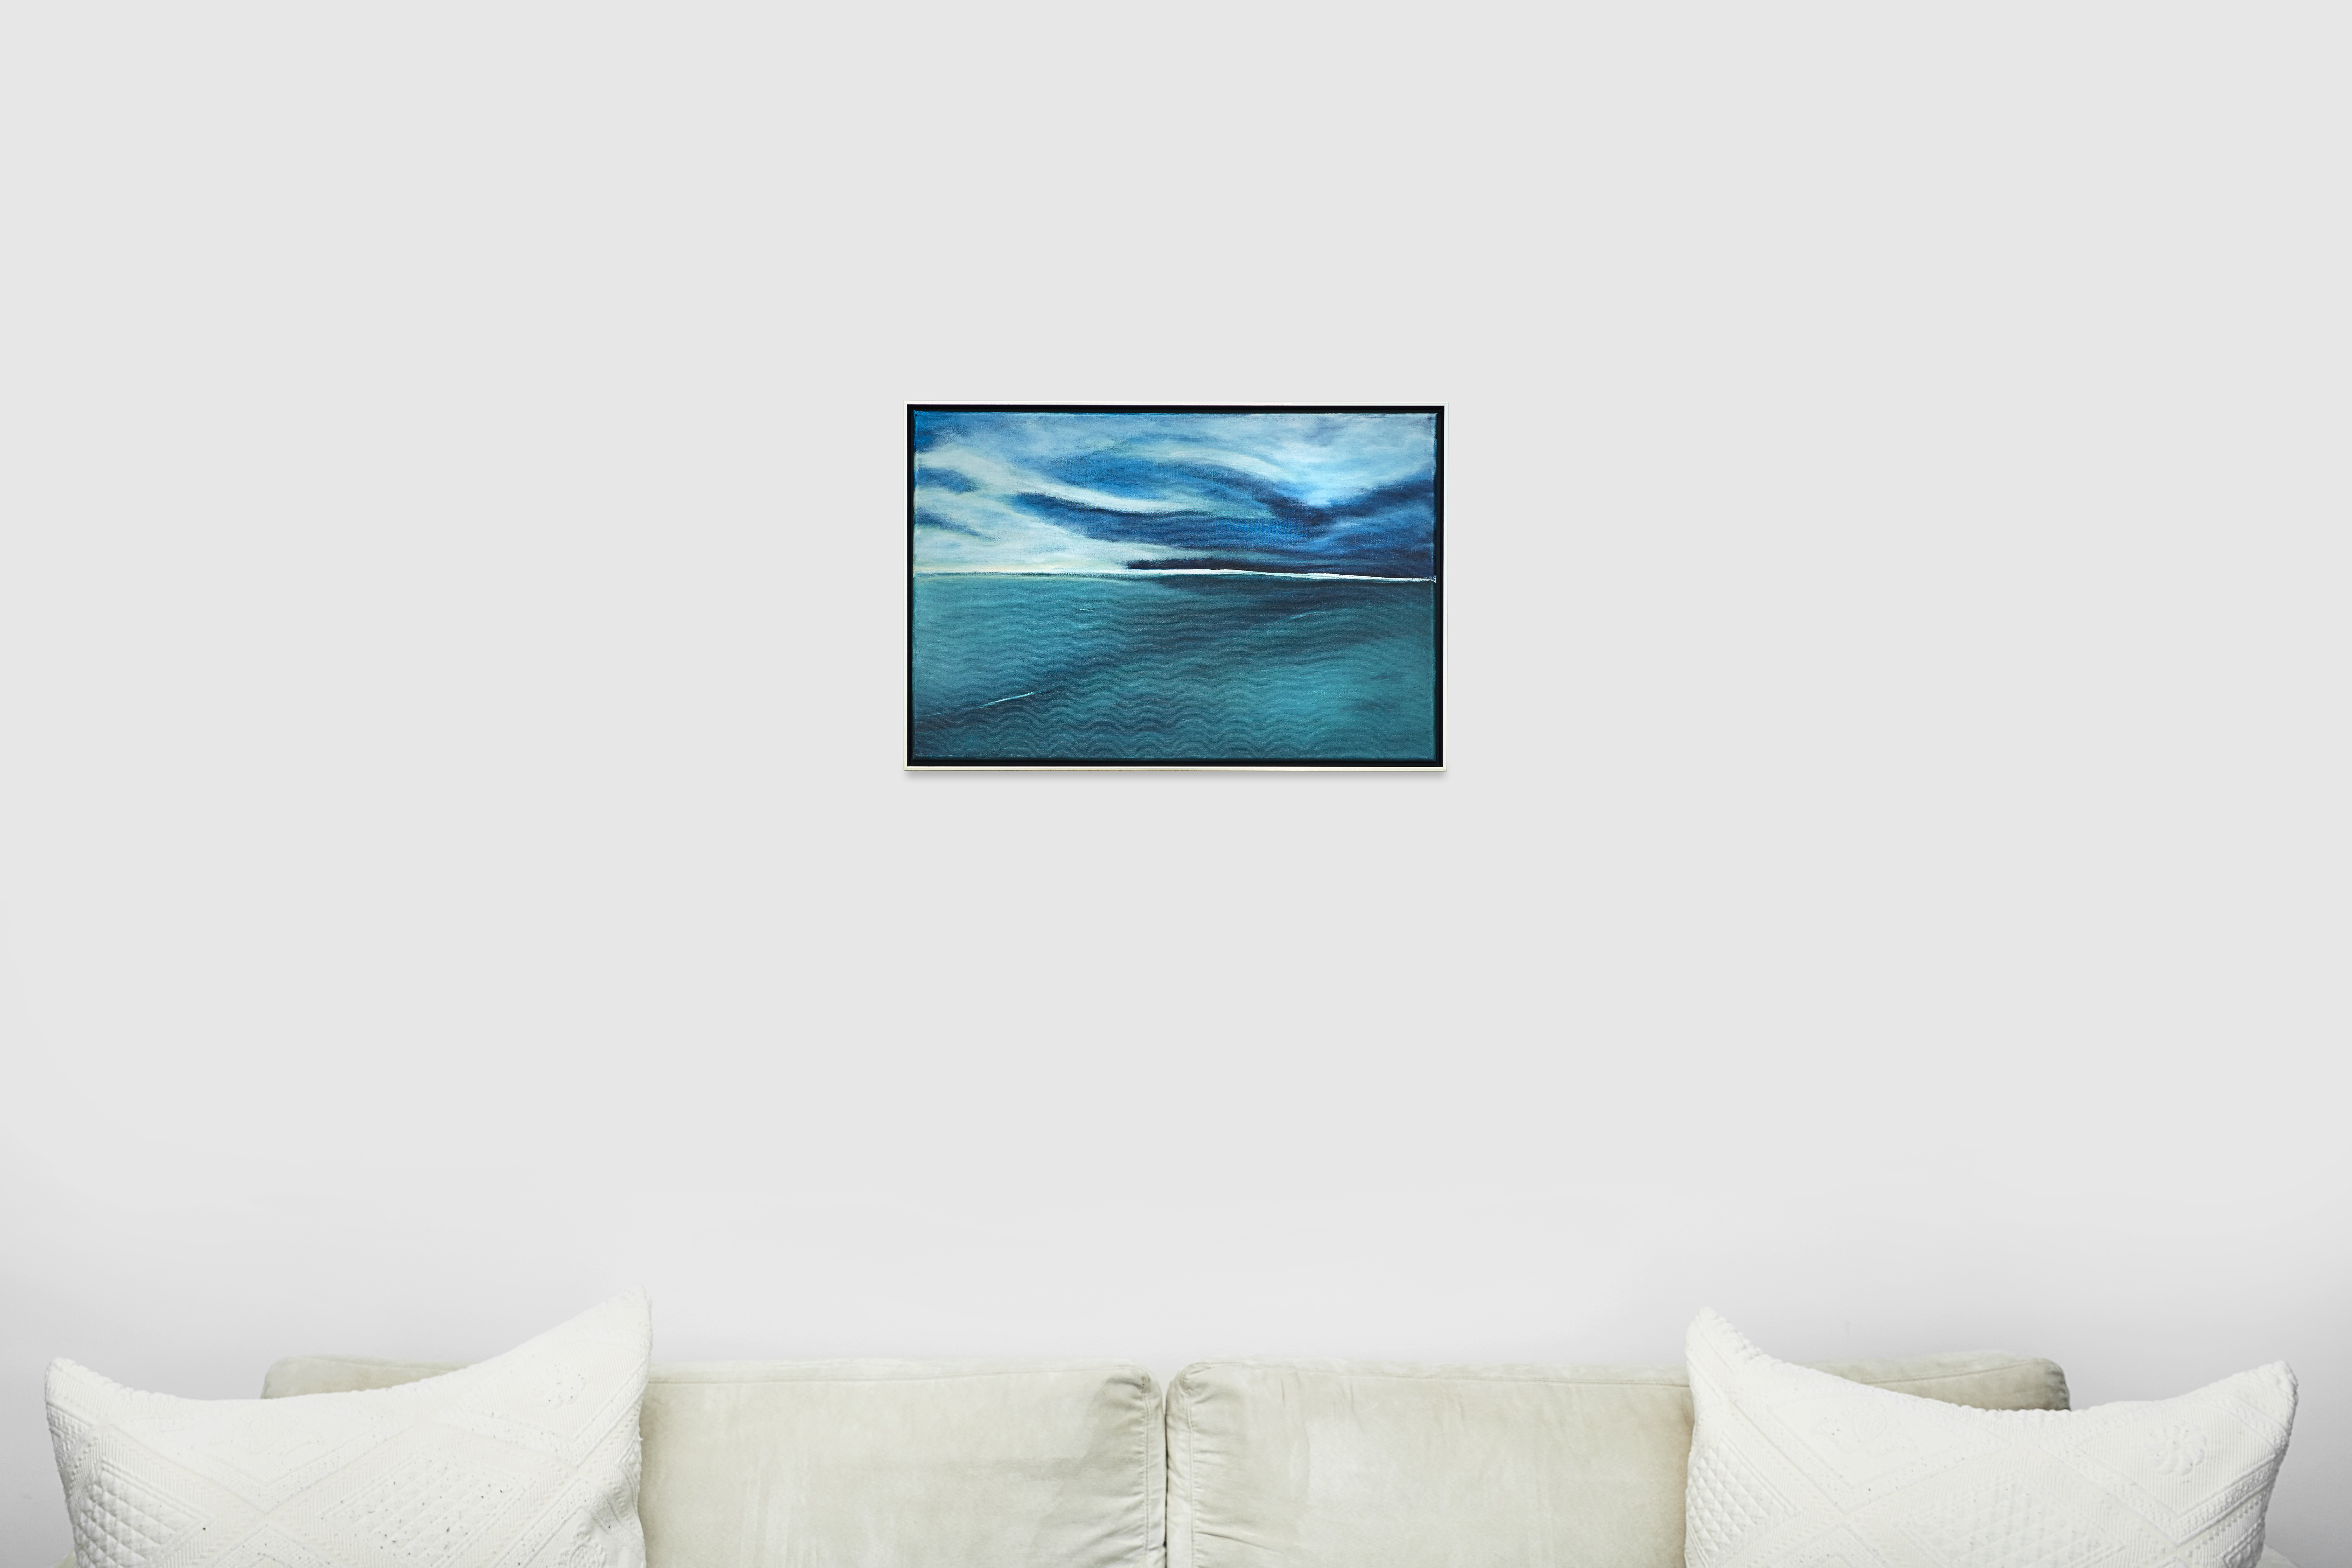 Soulartist Kunst Gemälde Wasser The calm